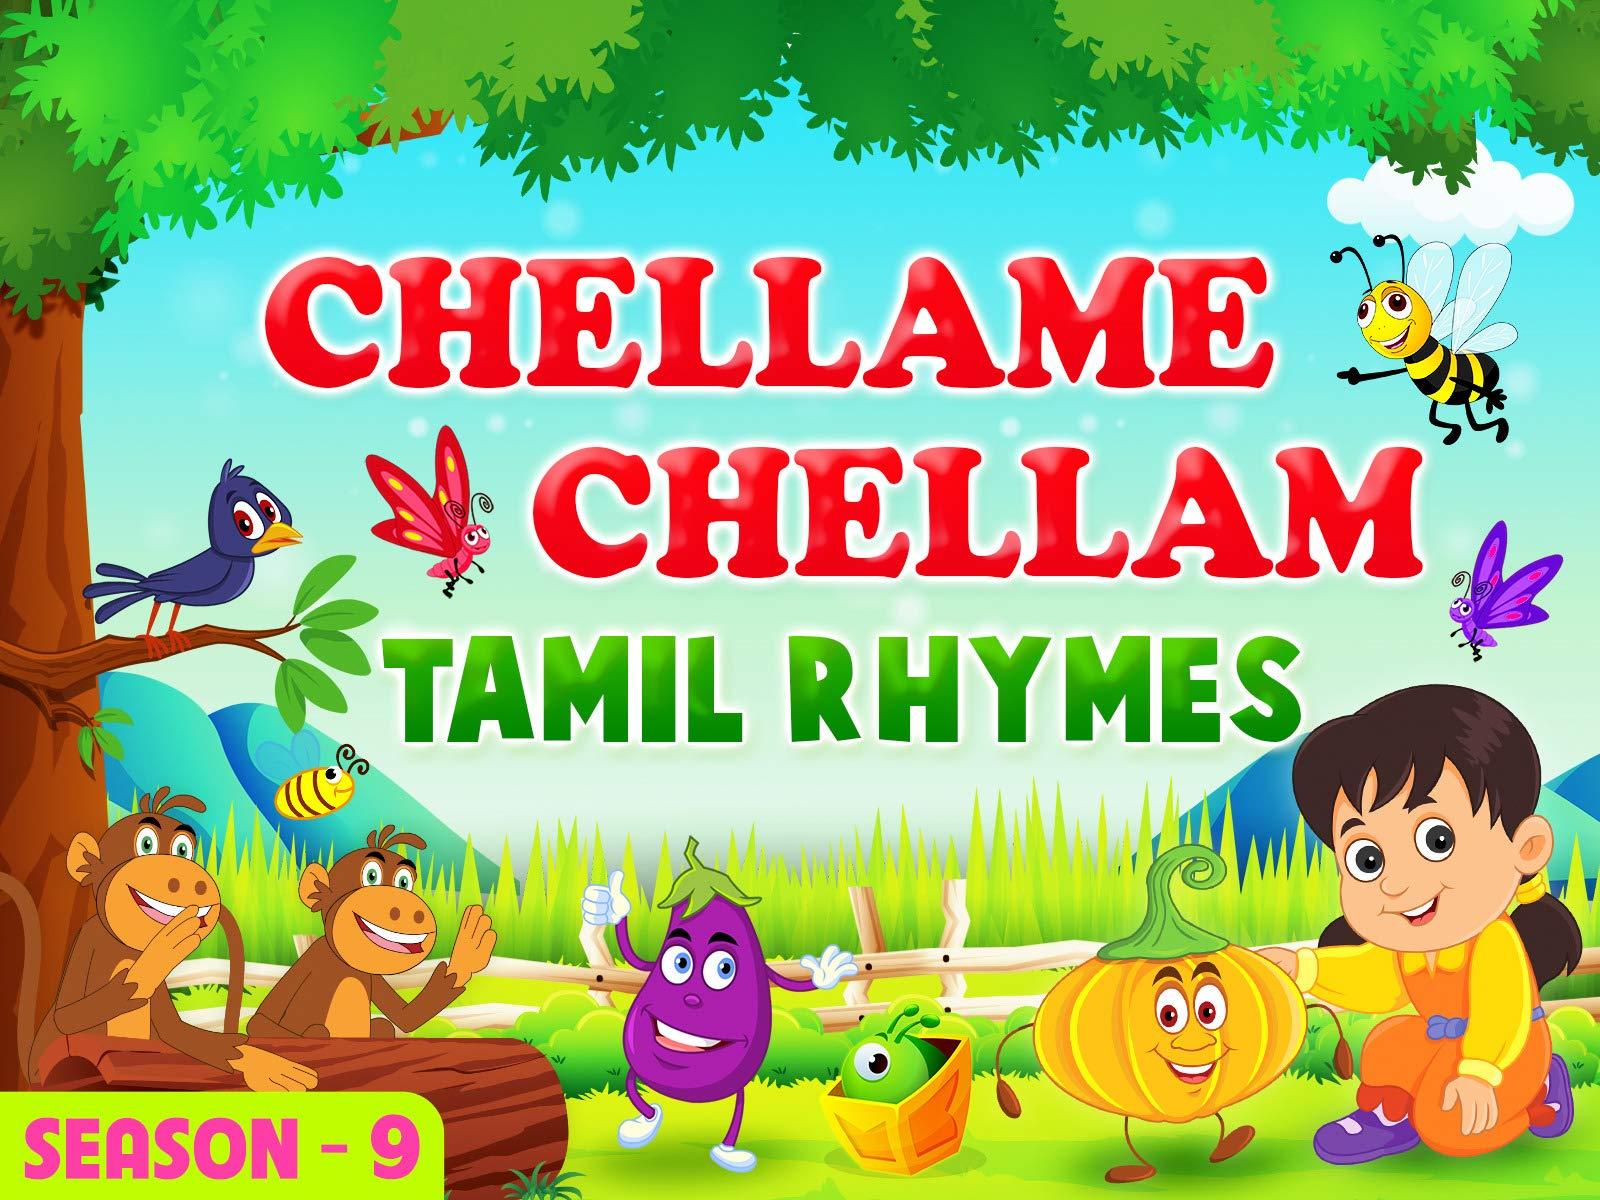 Chellame Chellam - Season 9